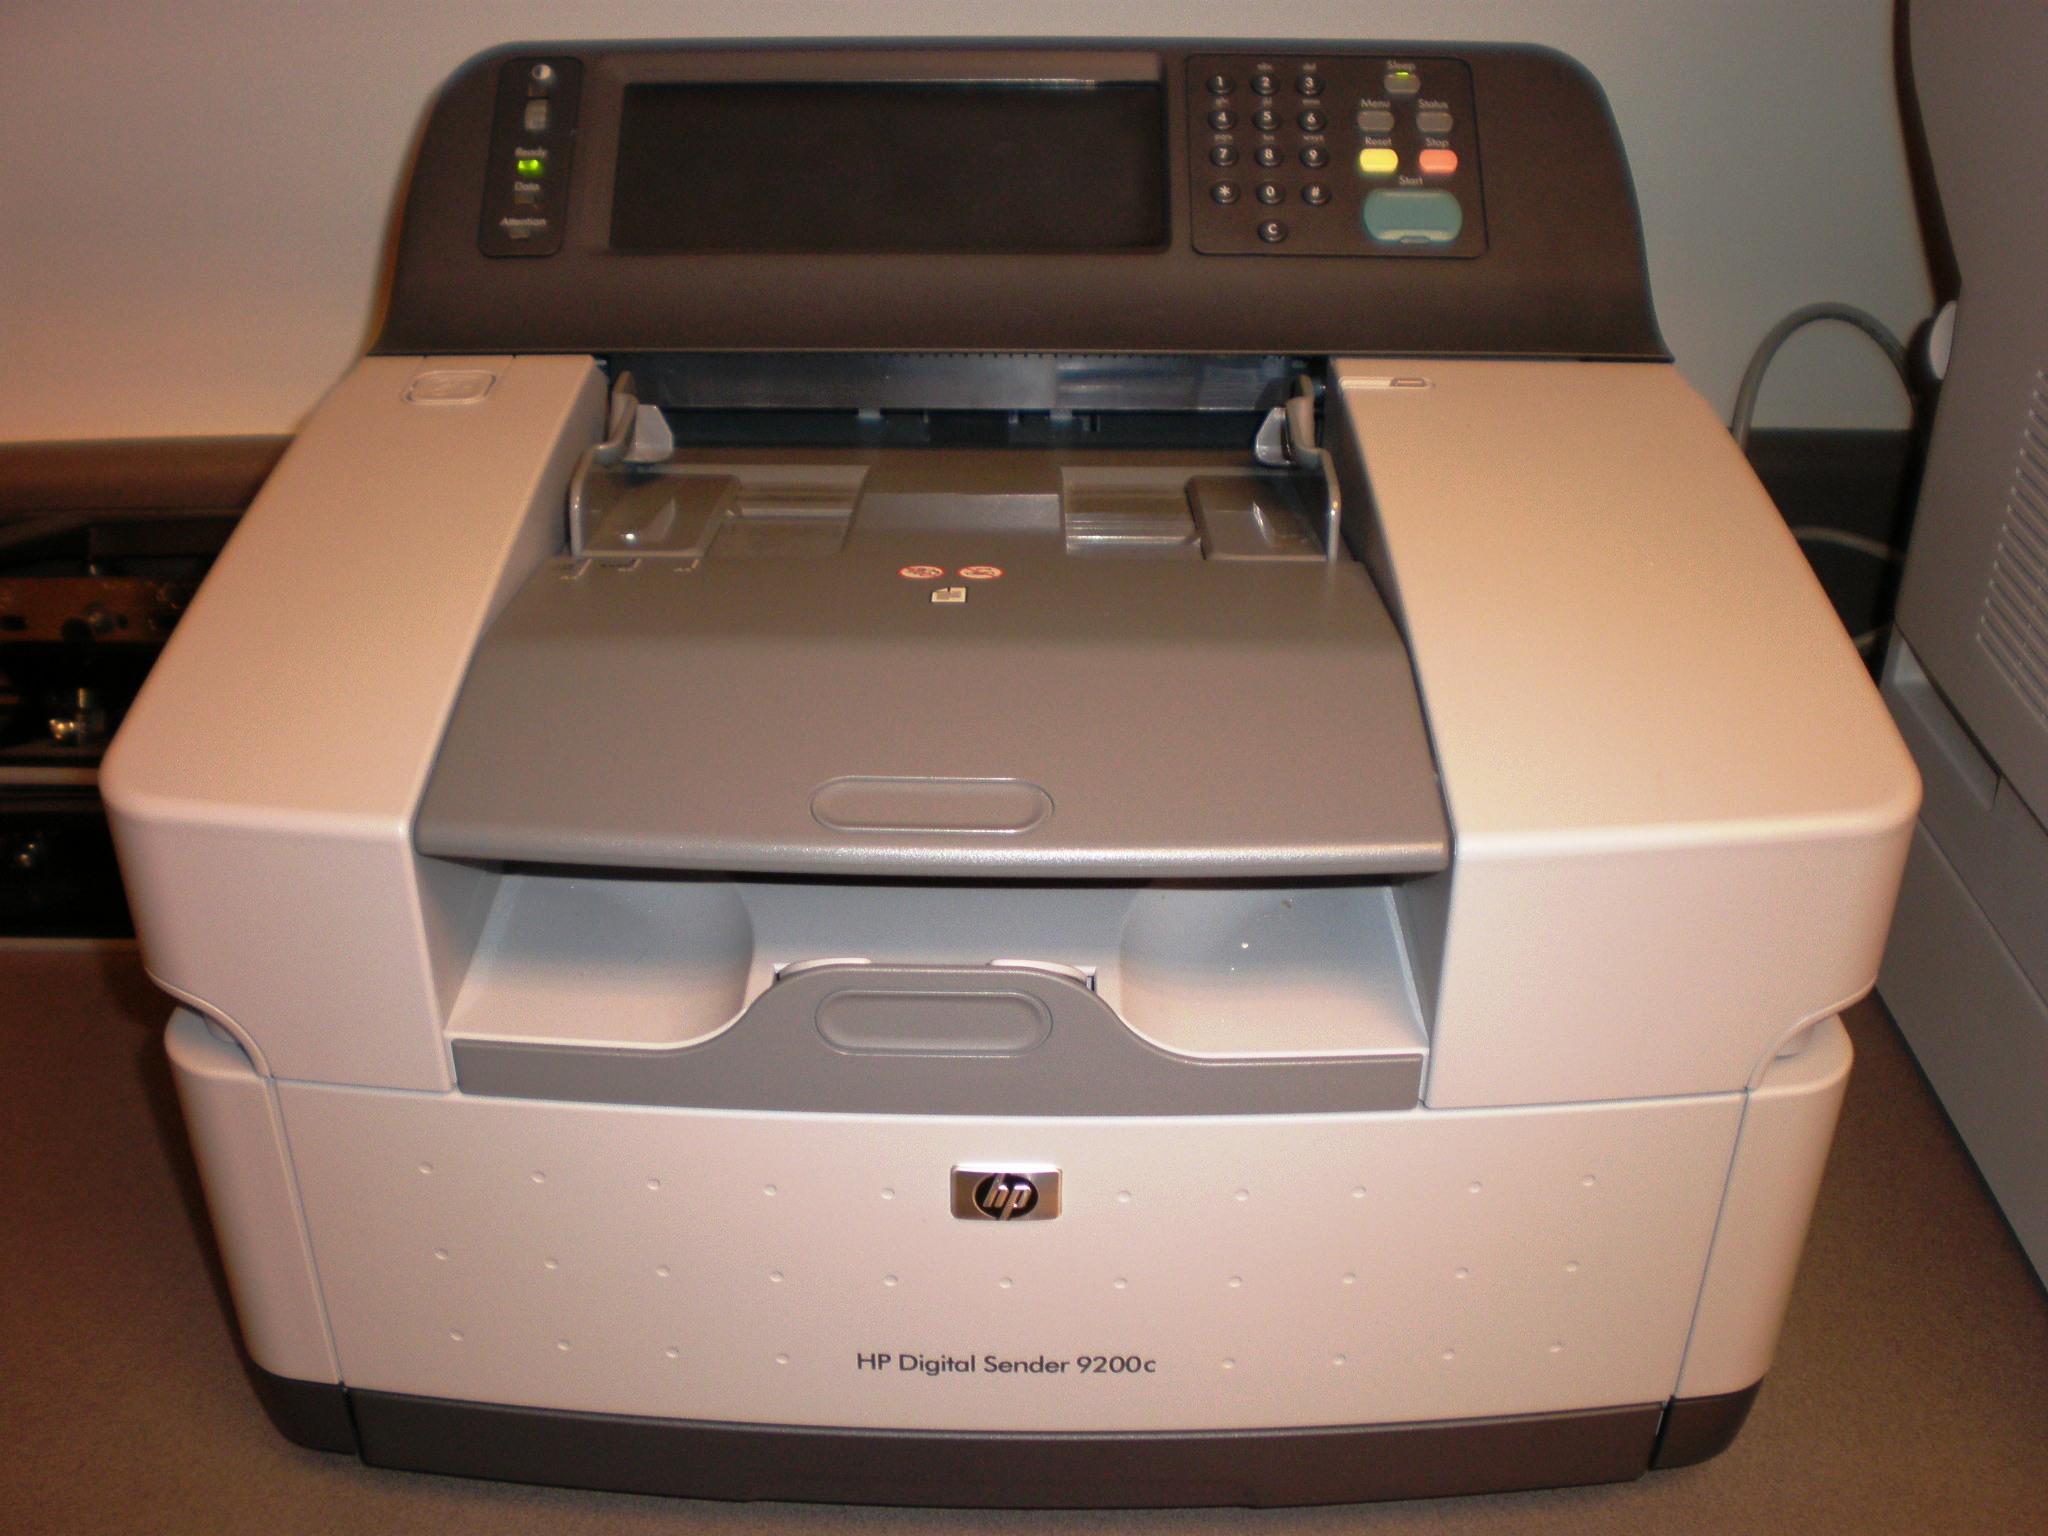 HP DIGITAL SCANNER 9200C DRIVER FOR PC